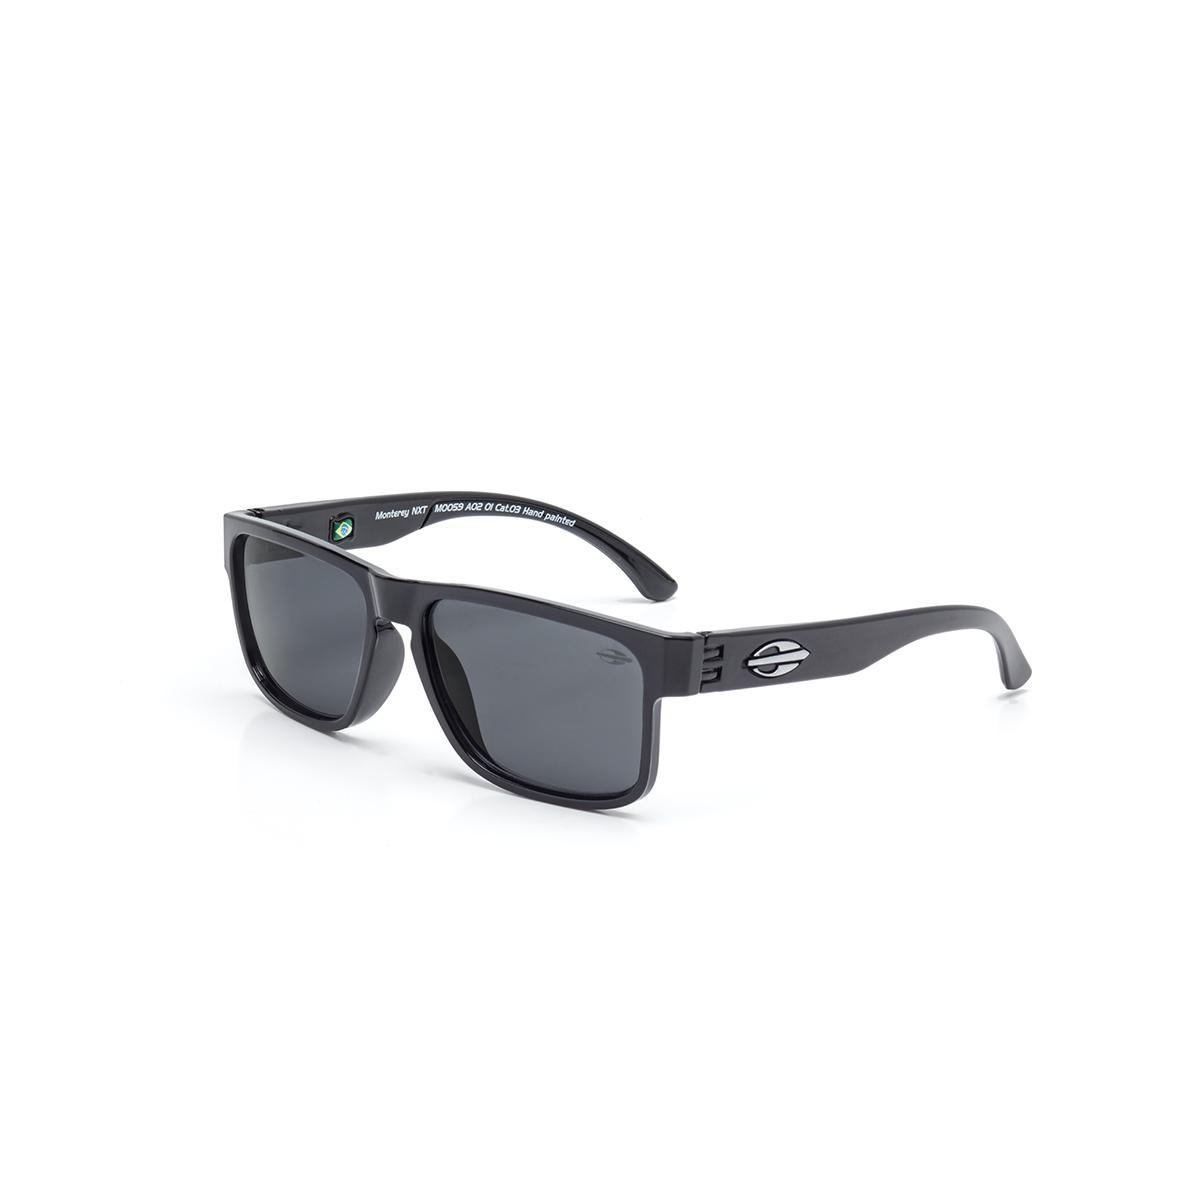 f53342673fd72 Óculos de Sol Mormaii MONTEREY NXT M0059 A02 01 Preto Lente Cinza Tam 48 R   189,99 à vista. Adicionar à sacola